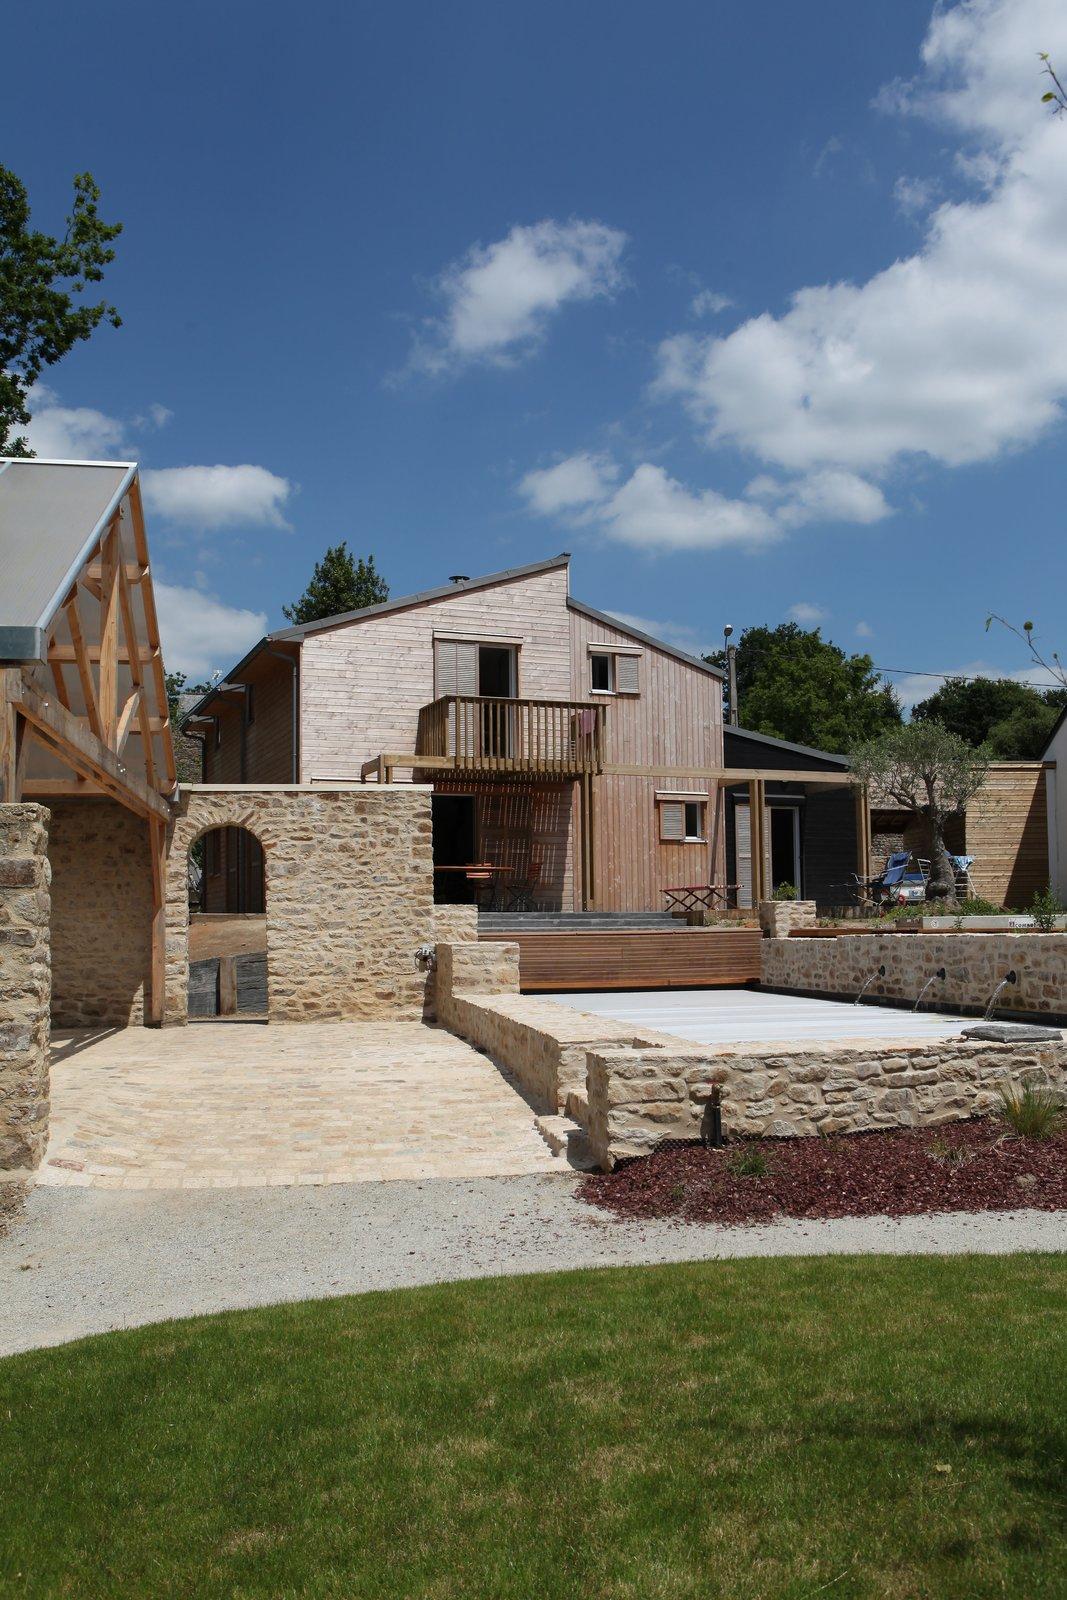 A bioclimatic house in Auray, Brittany  France Patrice Bideau  A bioclimatic house in Auray, Brittany, France by a.typique Patrice Bideau ( 2013 ) by Patrice Bideau